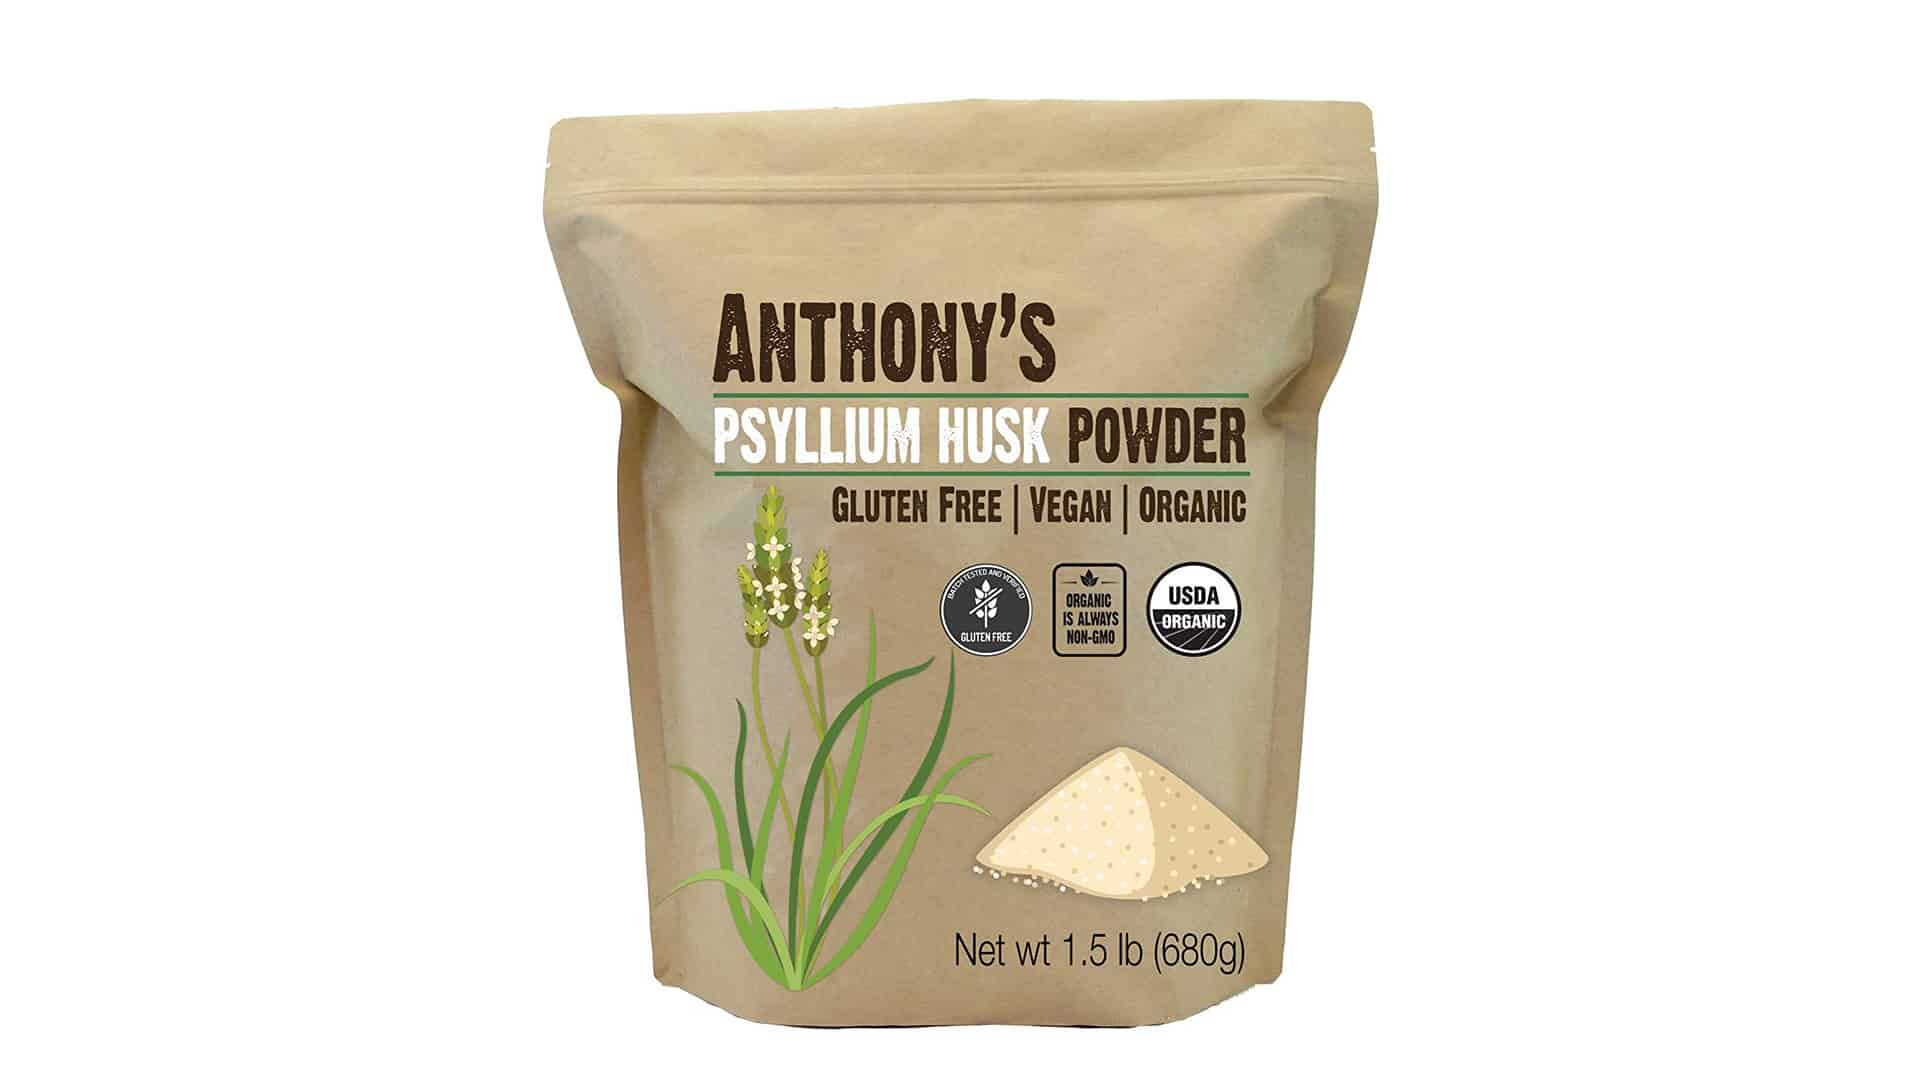 Anthony's Organic Psyllium Husk